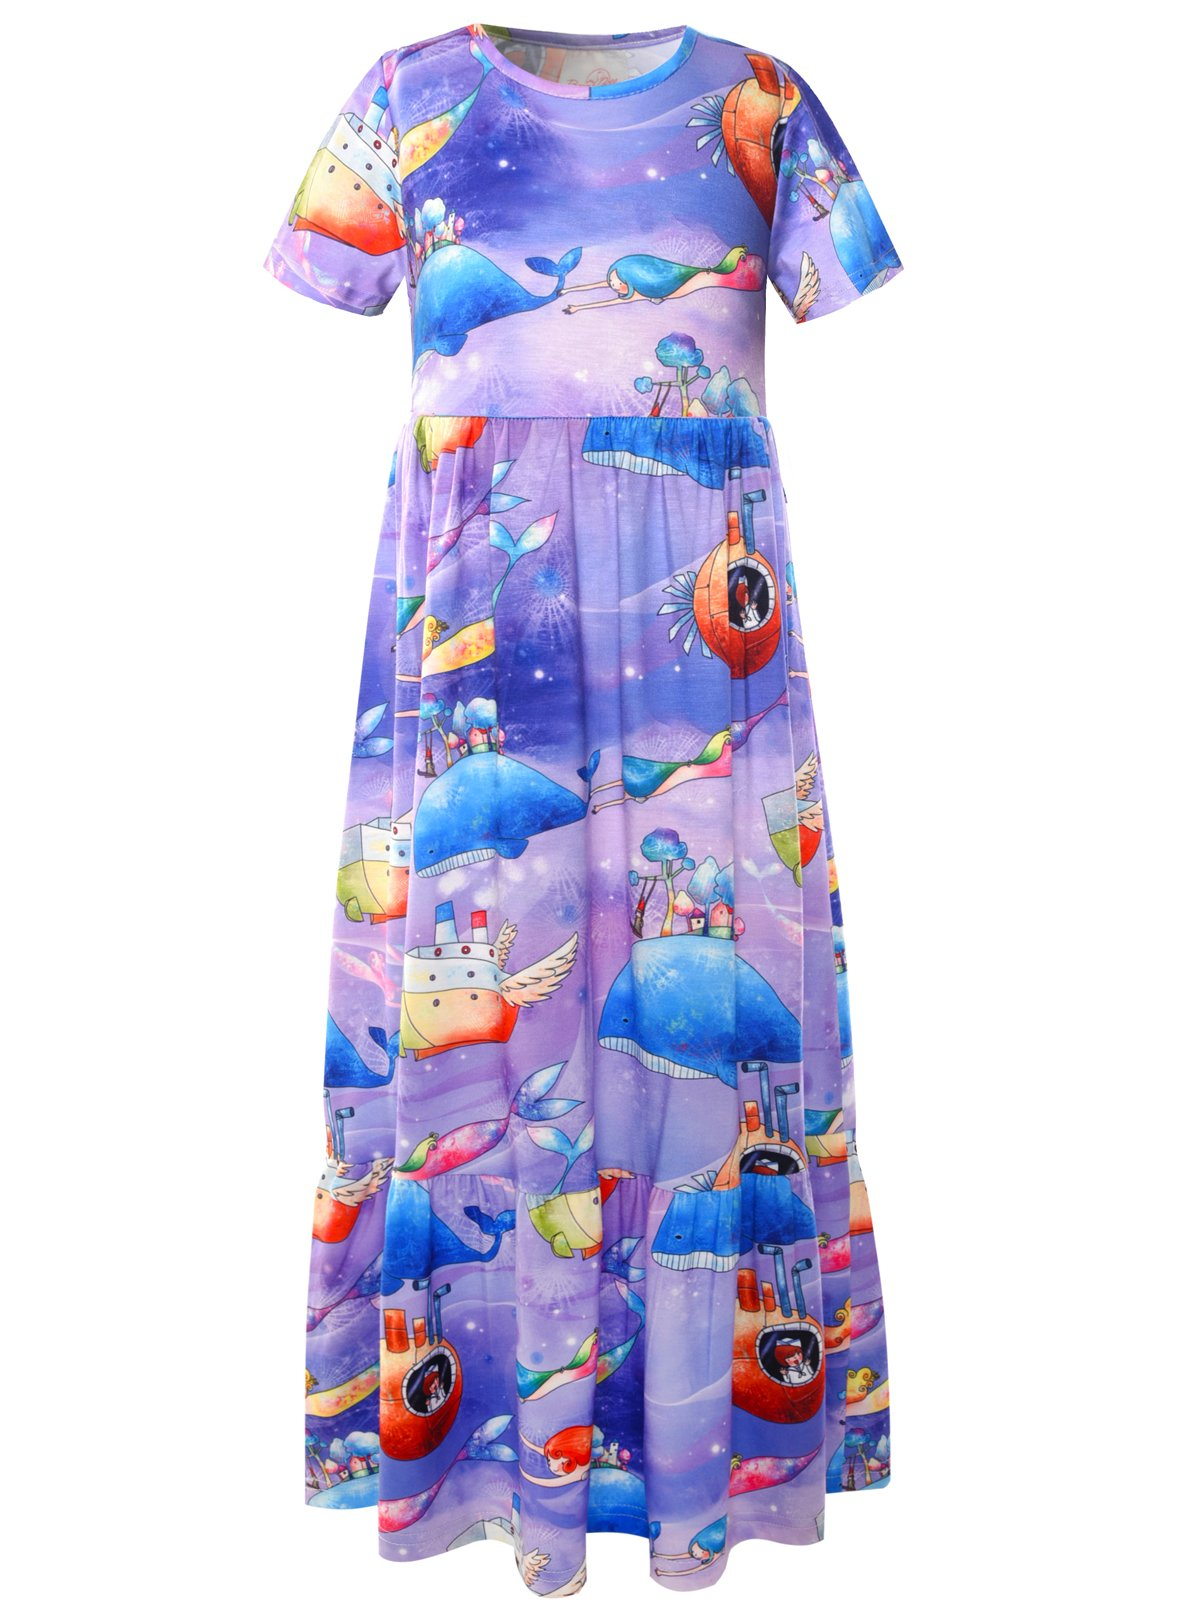 Bonny Billy Girls Maxi Dress Sea Mermaid Printing Long Dress for Kids 10-12 Whale